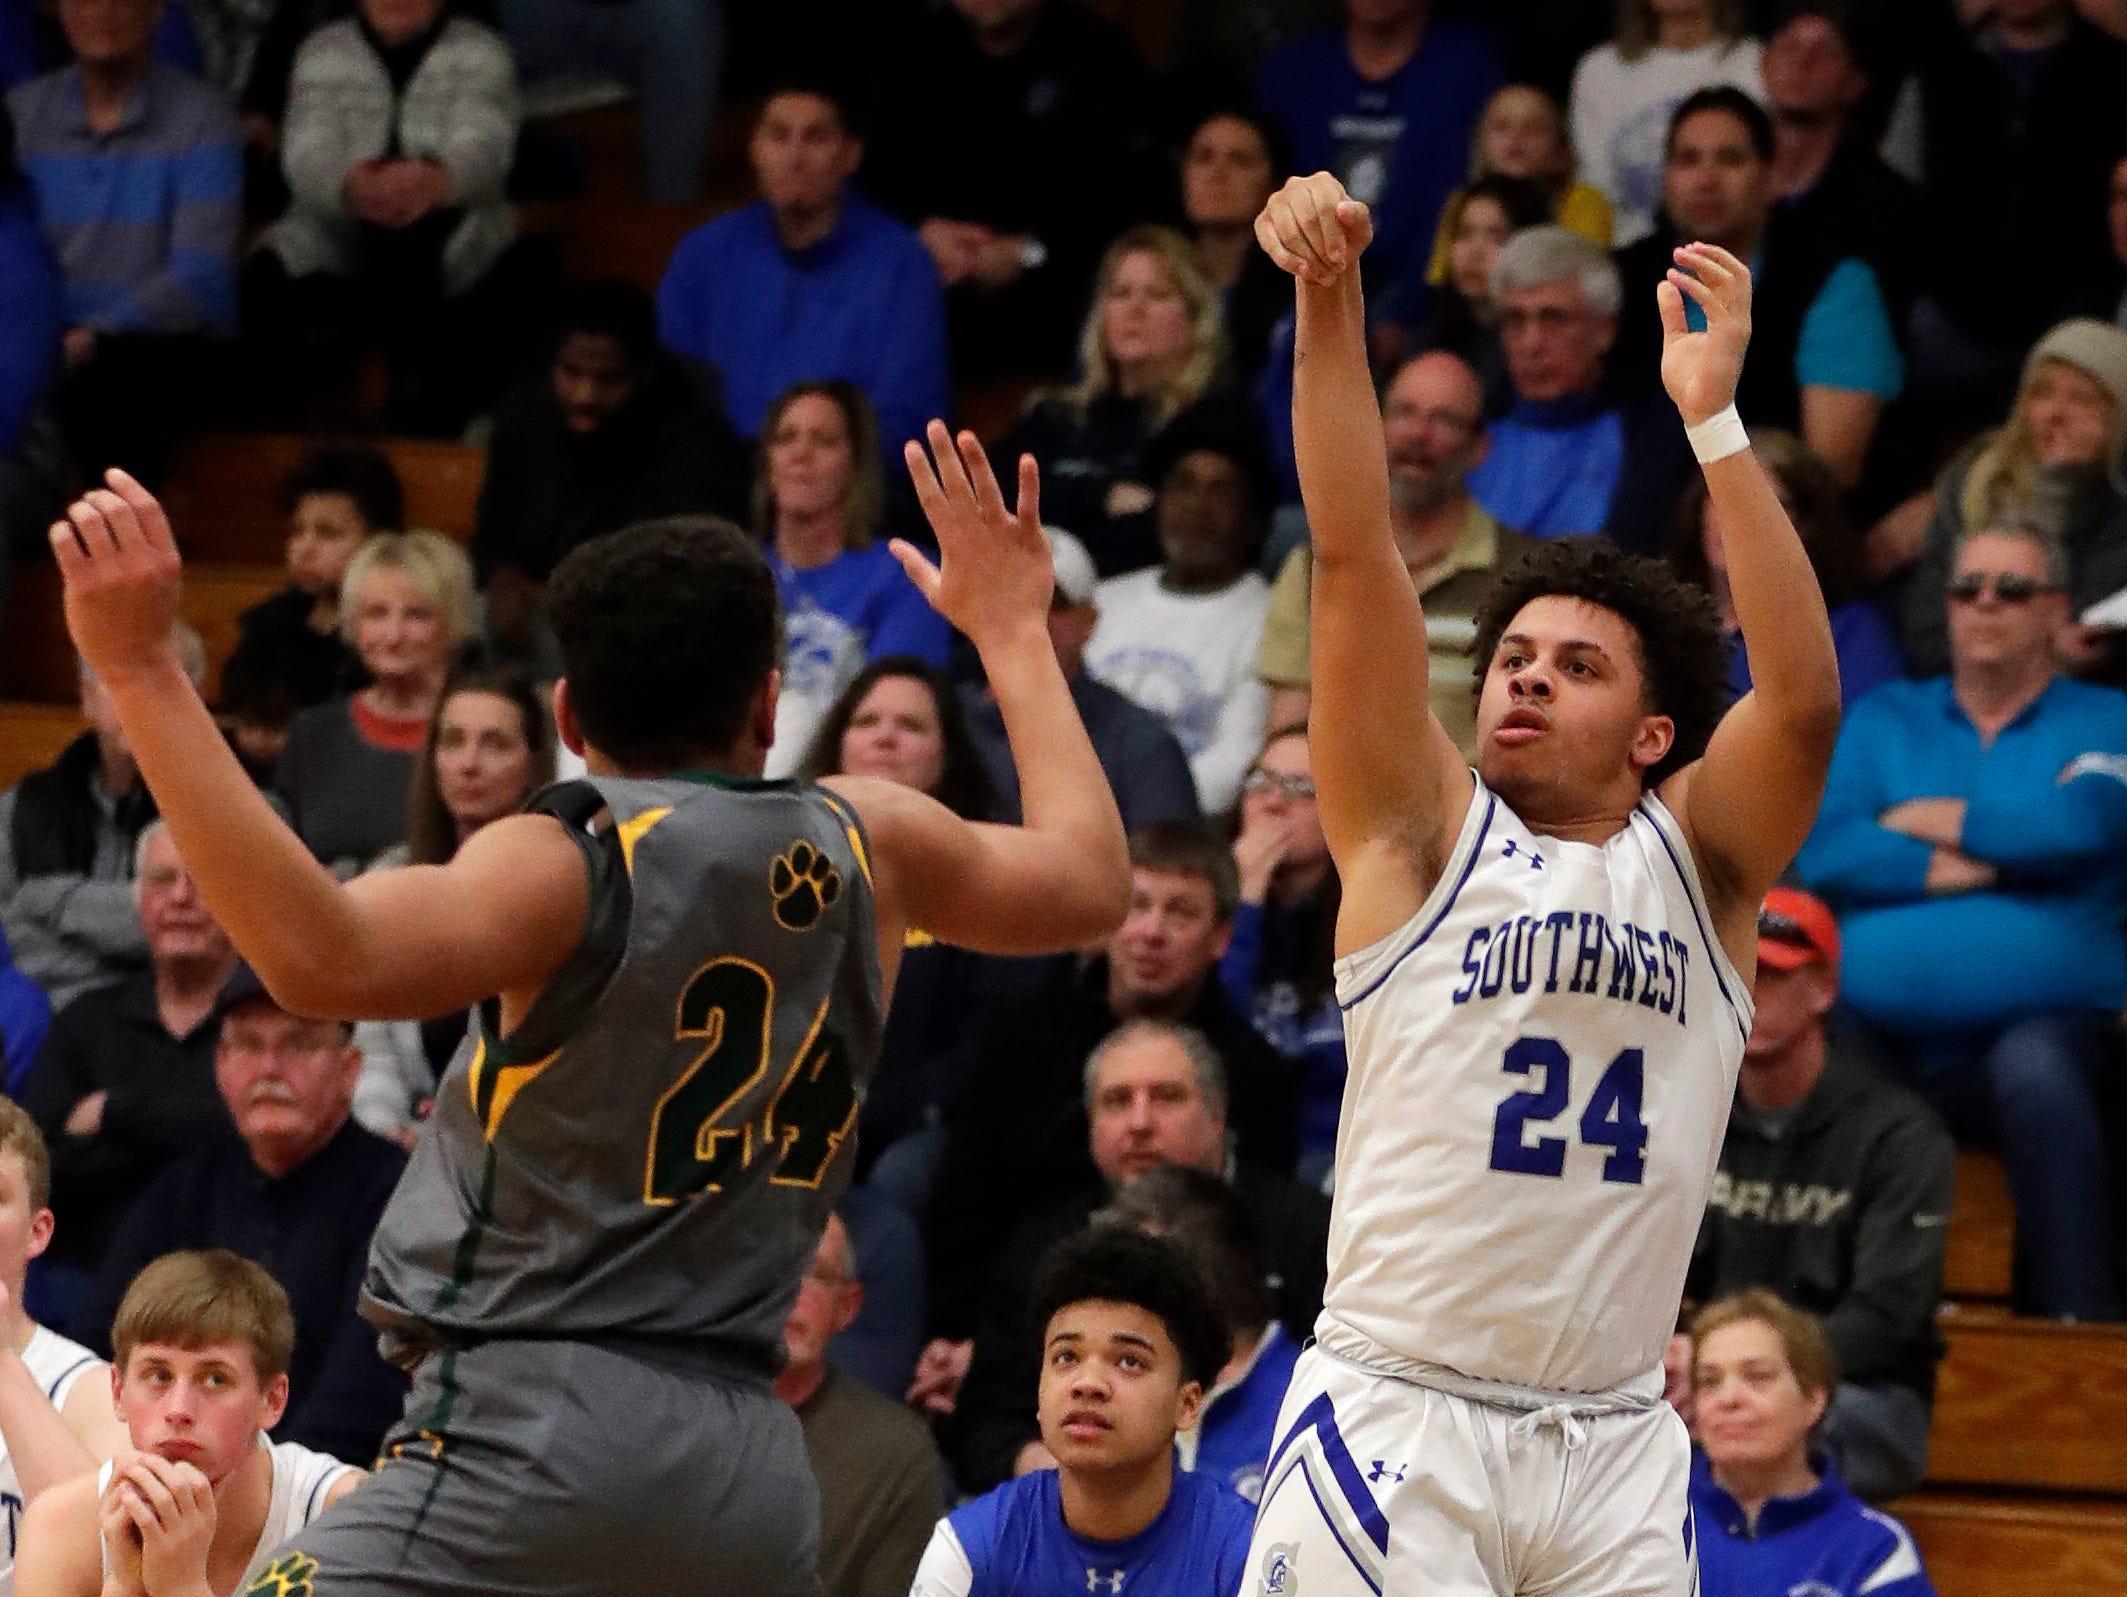 Green Bay Southwest defeated Ashwaubenon 68-58 on March 1, 2019, in a WIAA Division 2 boys basketball regional semifinal.